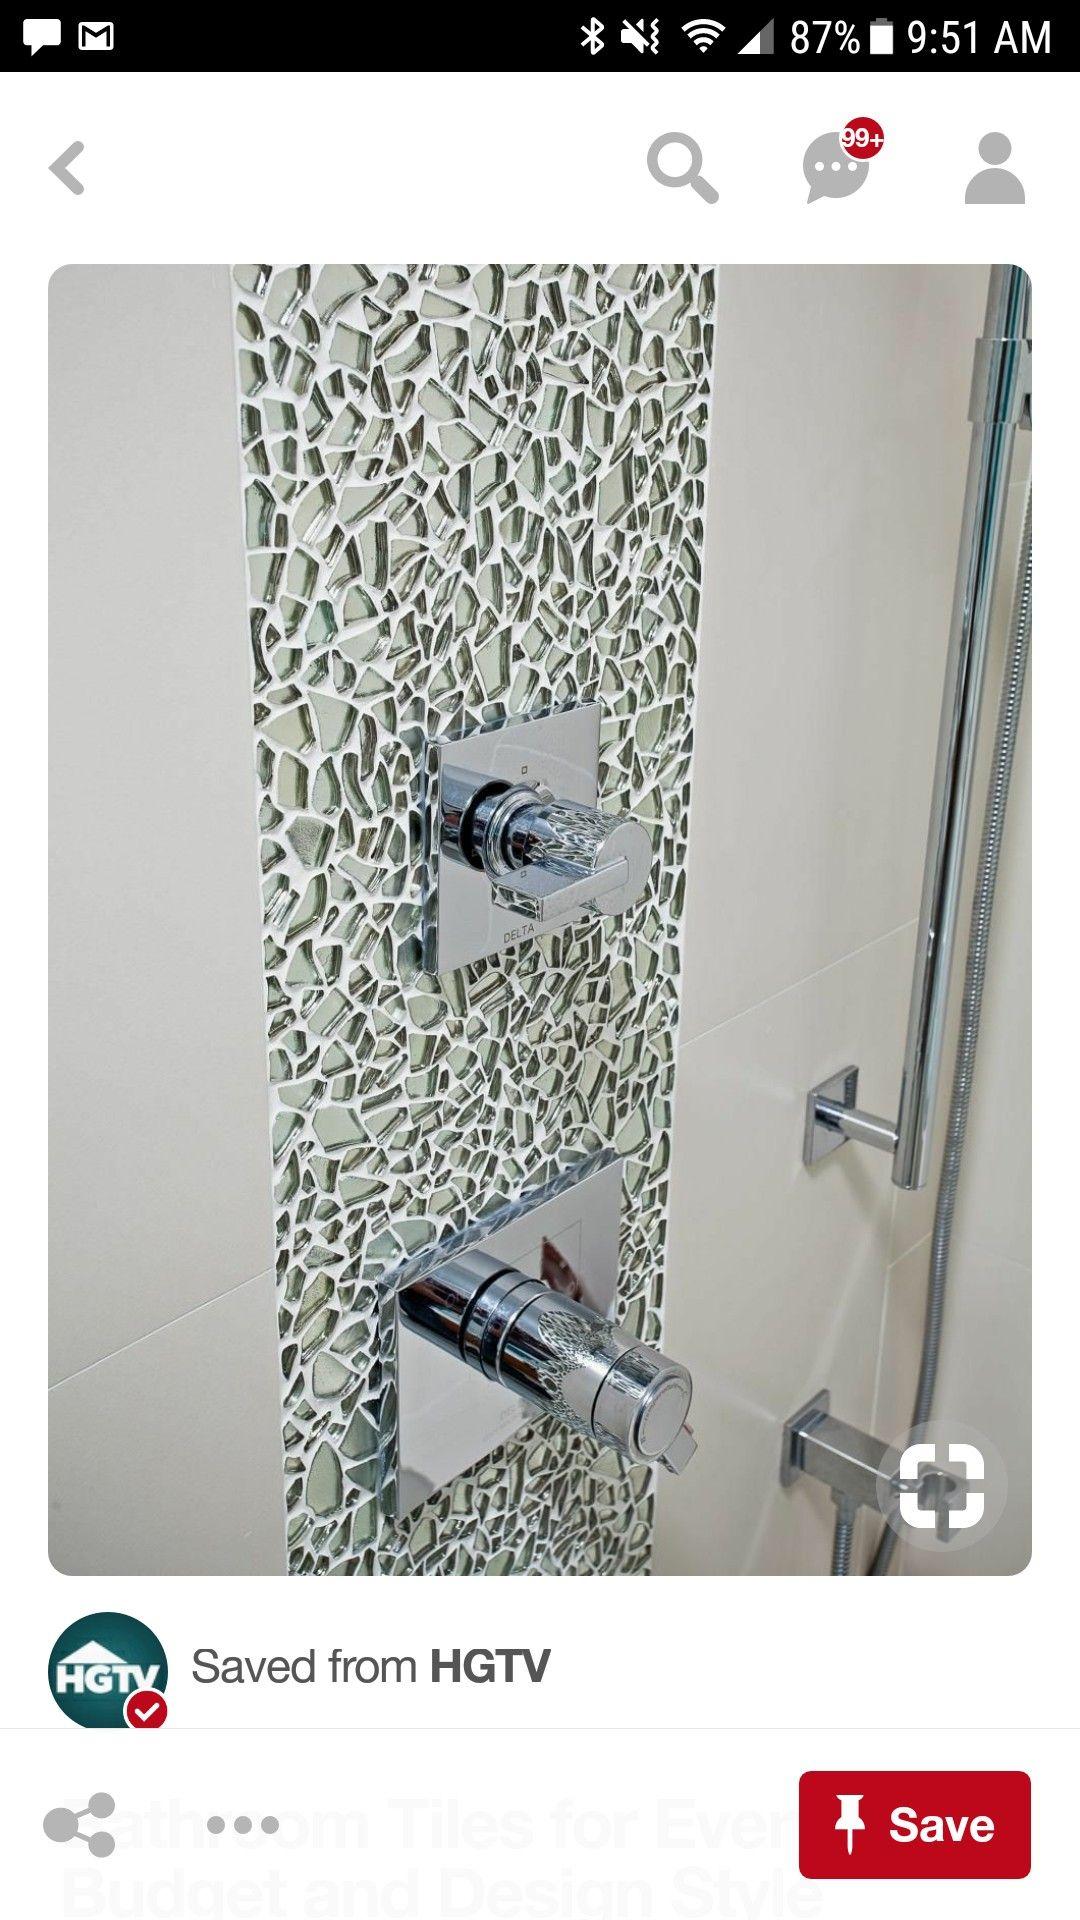 Pin By Angela Snodgrass On Bathroom Remodel Pinterest Bath - Hatchett bathroom remodel